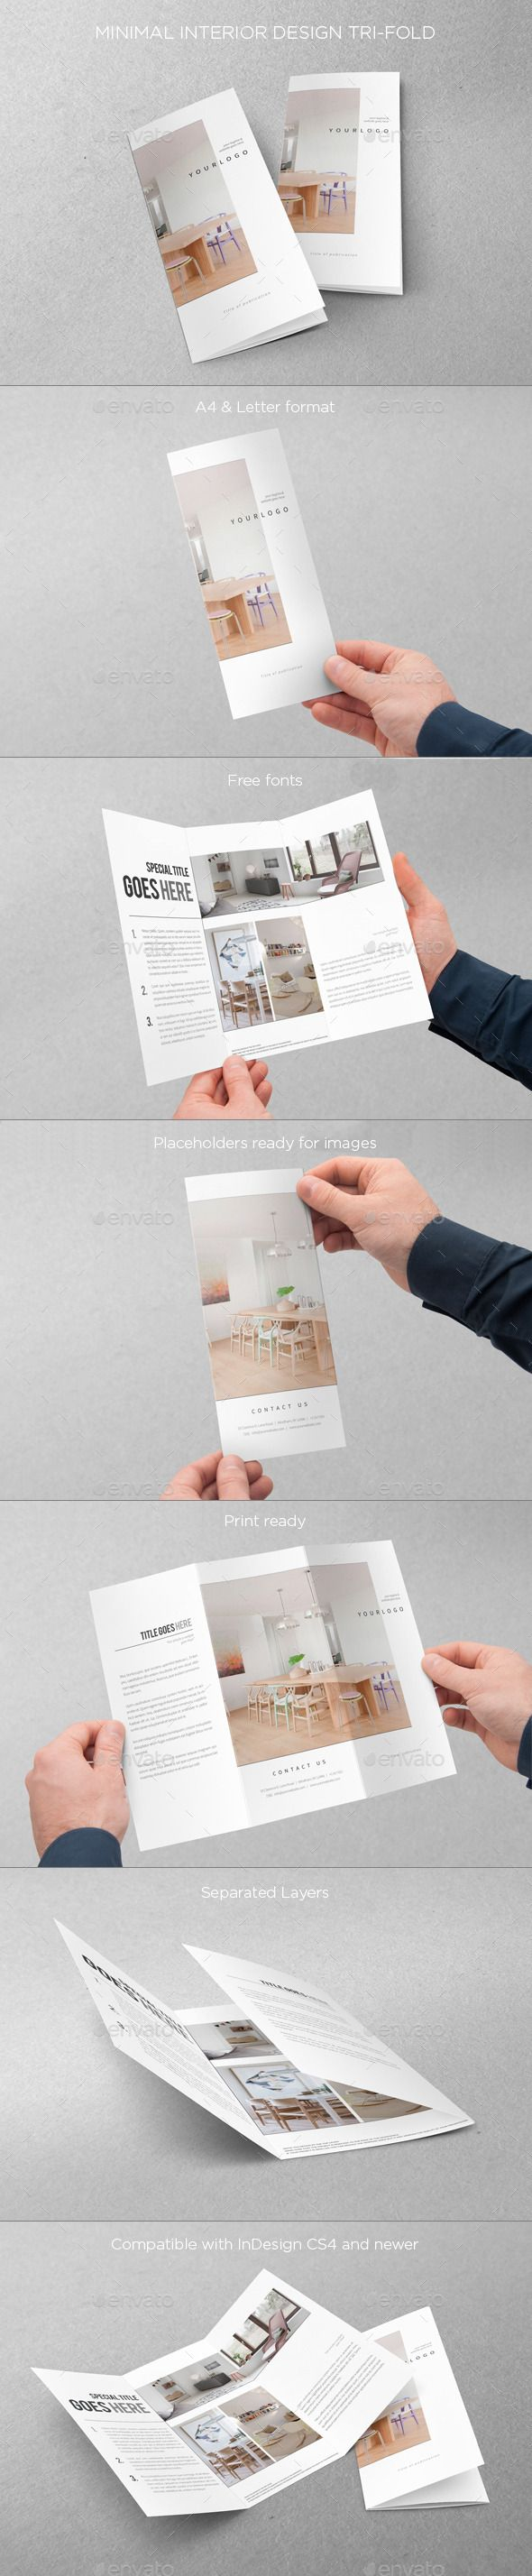 Minimal Interior Design Trifold - Brochures Print Templates